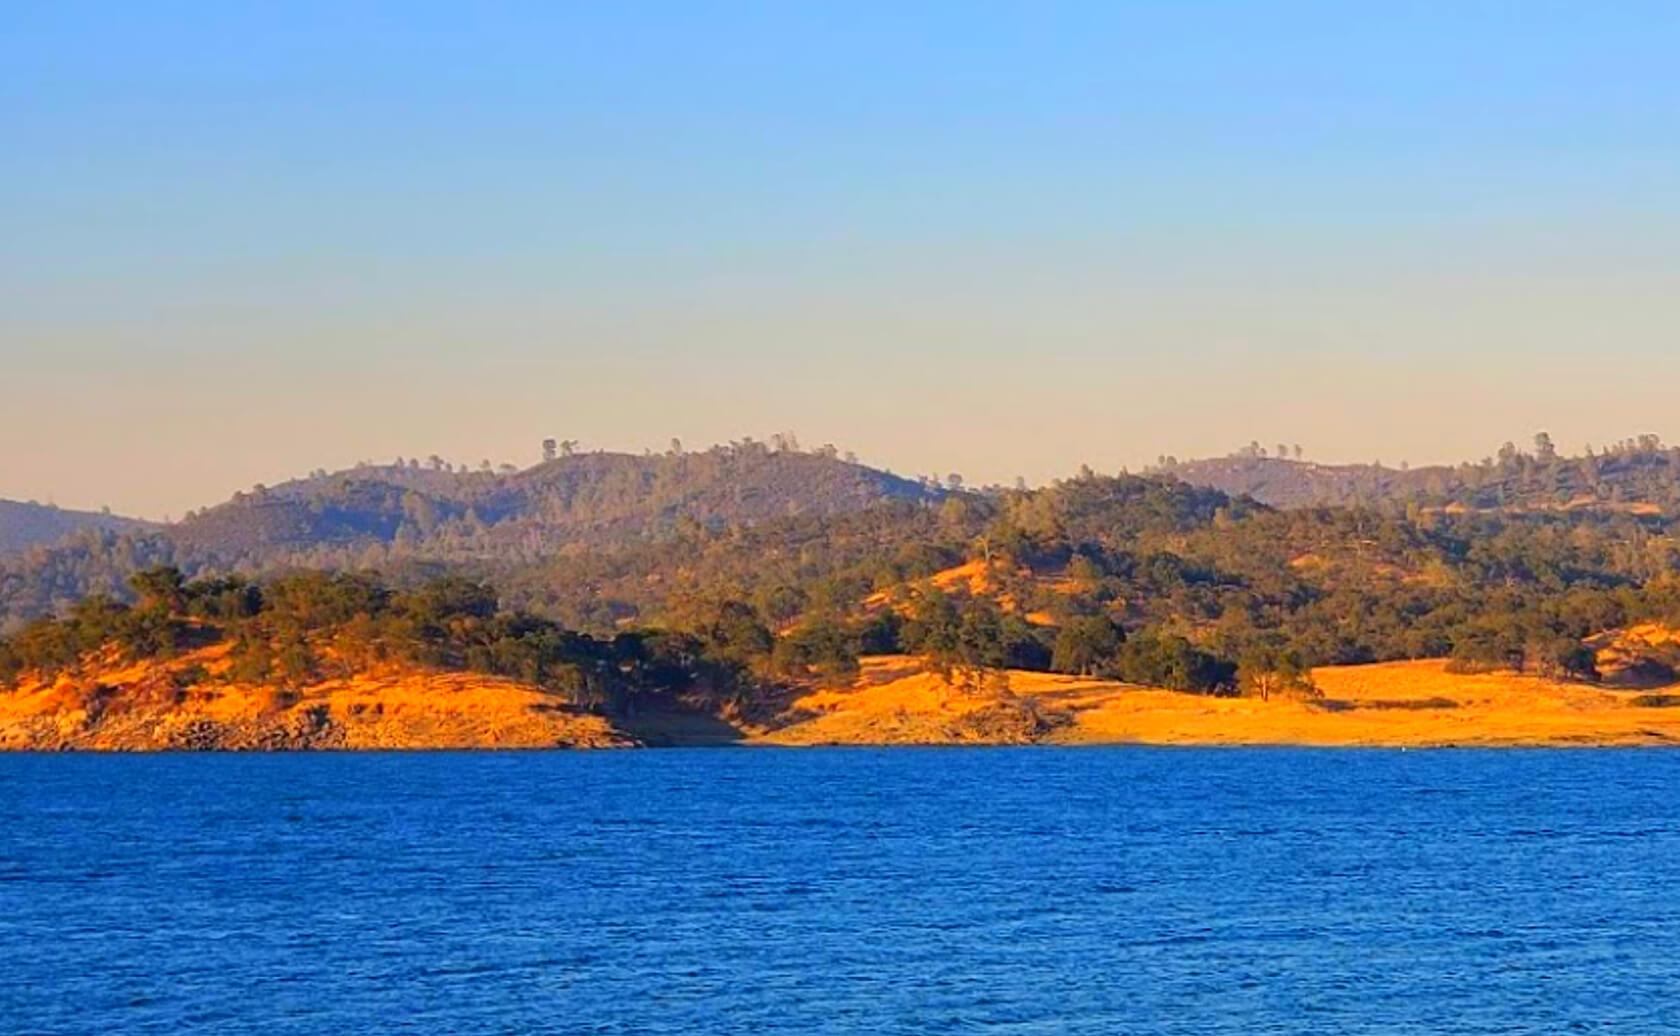 Folsom-Lake-Reservoir-Fishing-Guide-Report-California-04